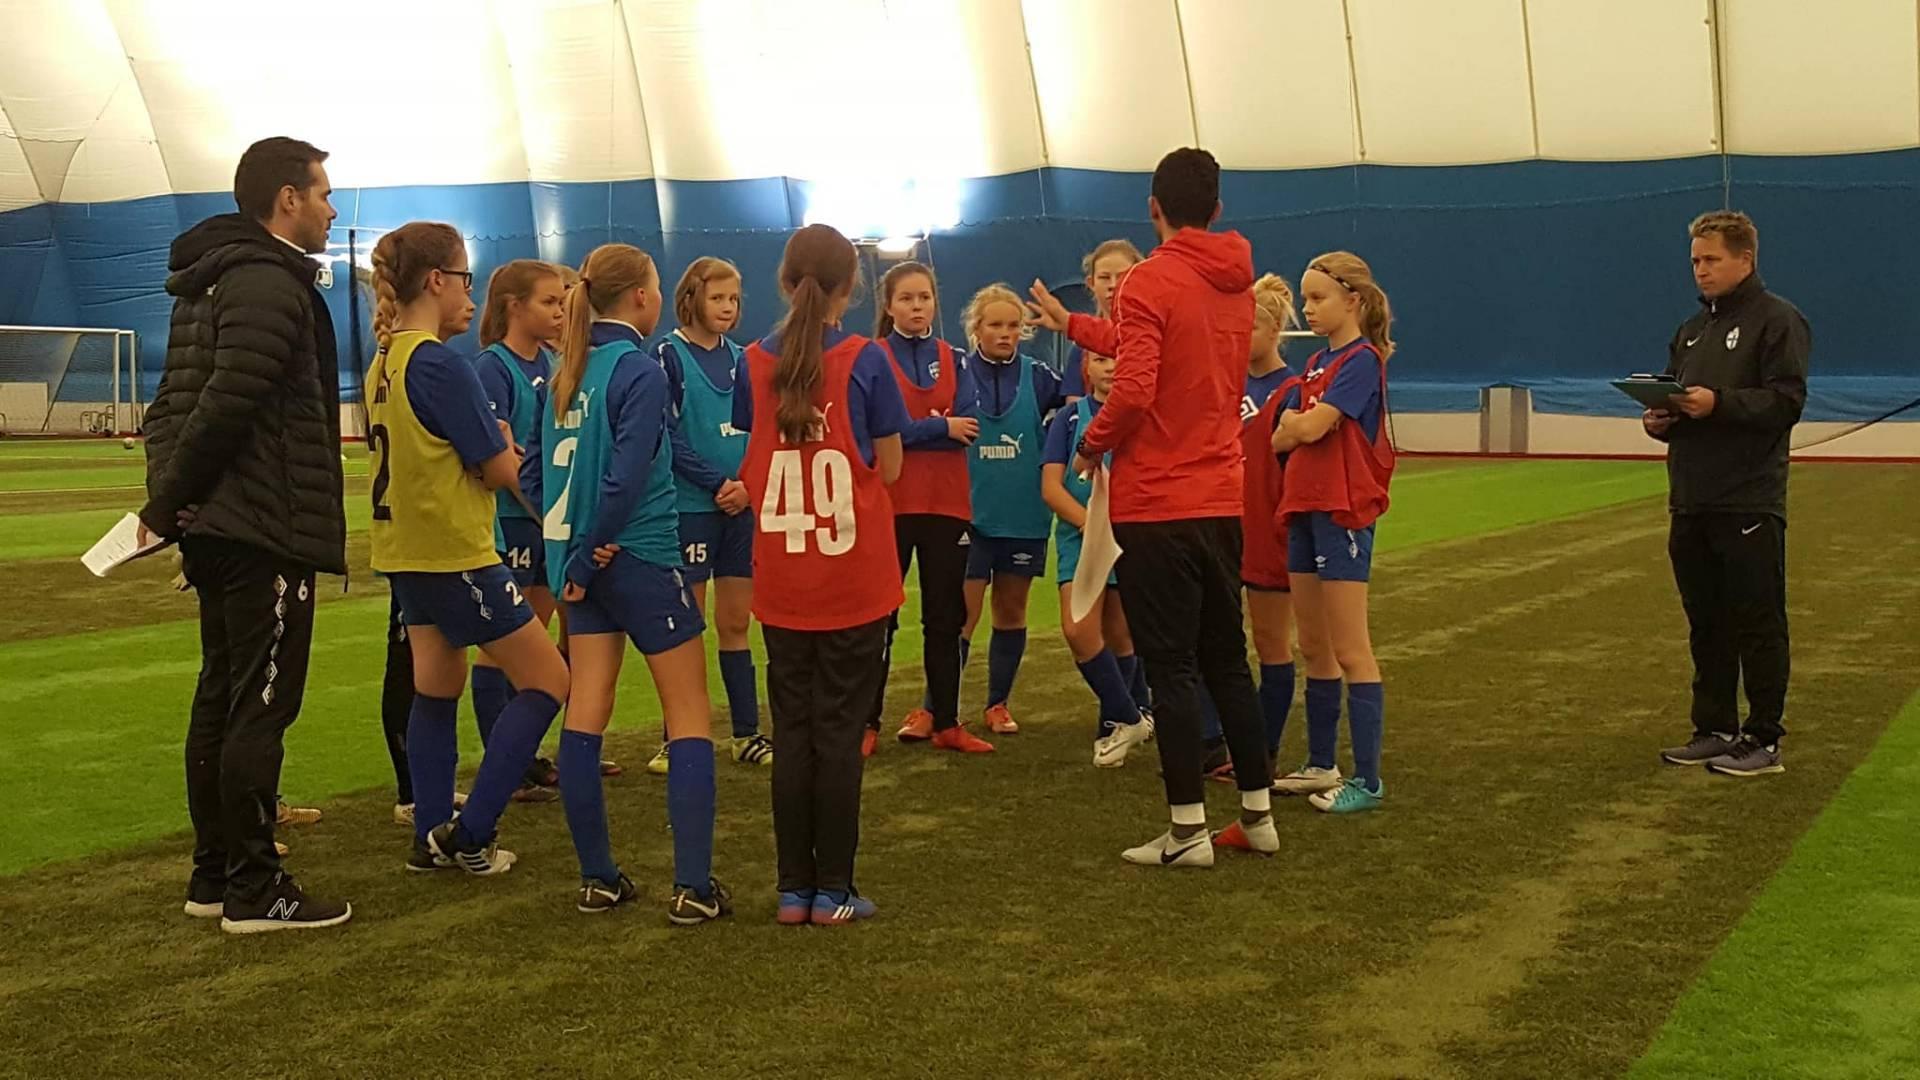 EBK T05 pääsi malliryhmäksi UEFA B -valmennuskurssille